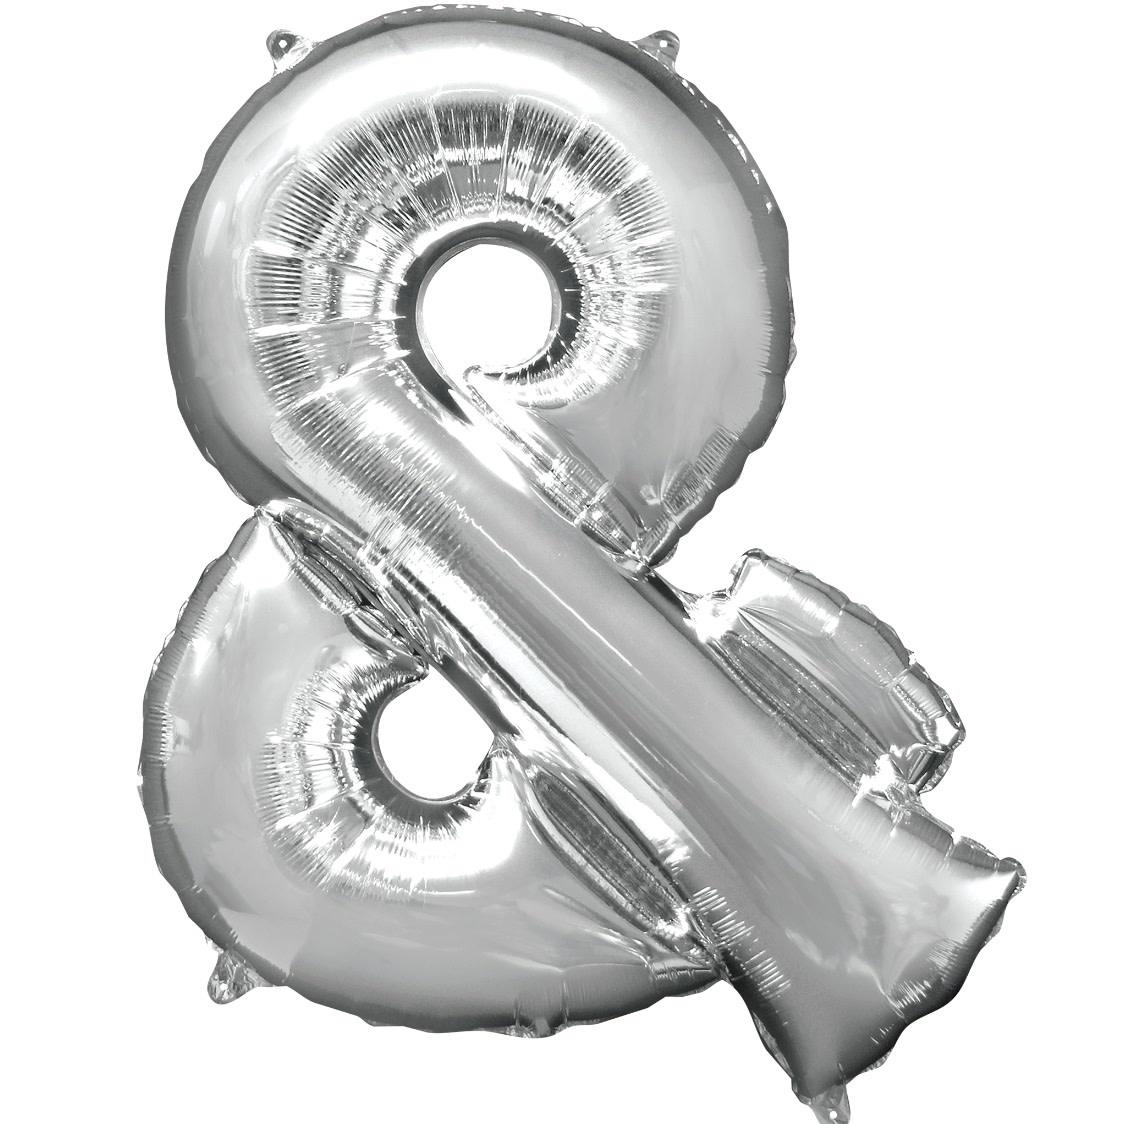 "Ampersand ""&"" Mylar Balloon -32"" Silver"